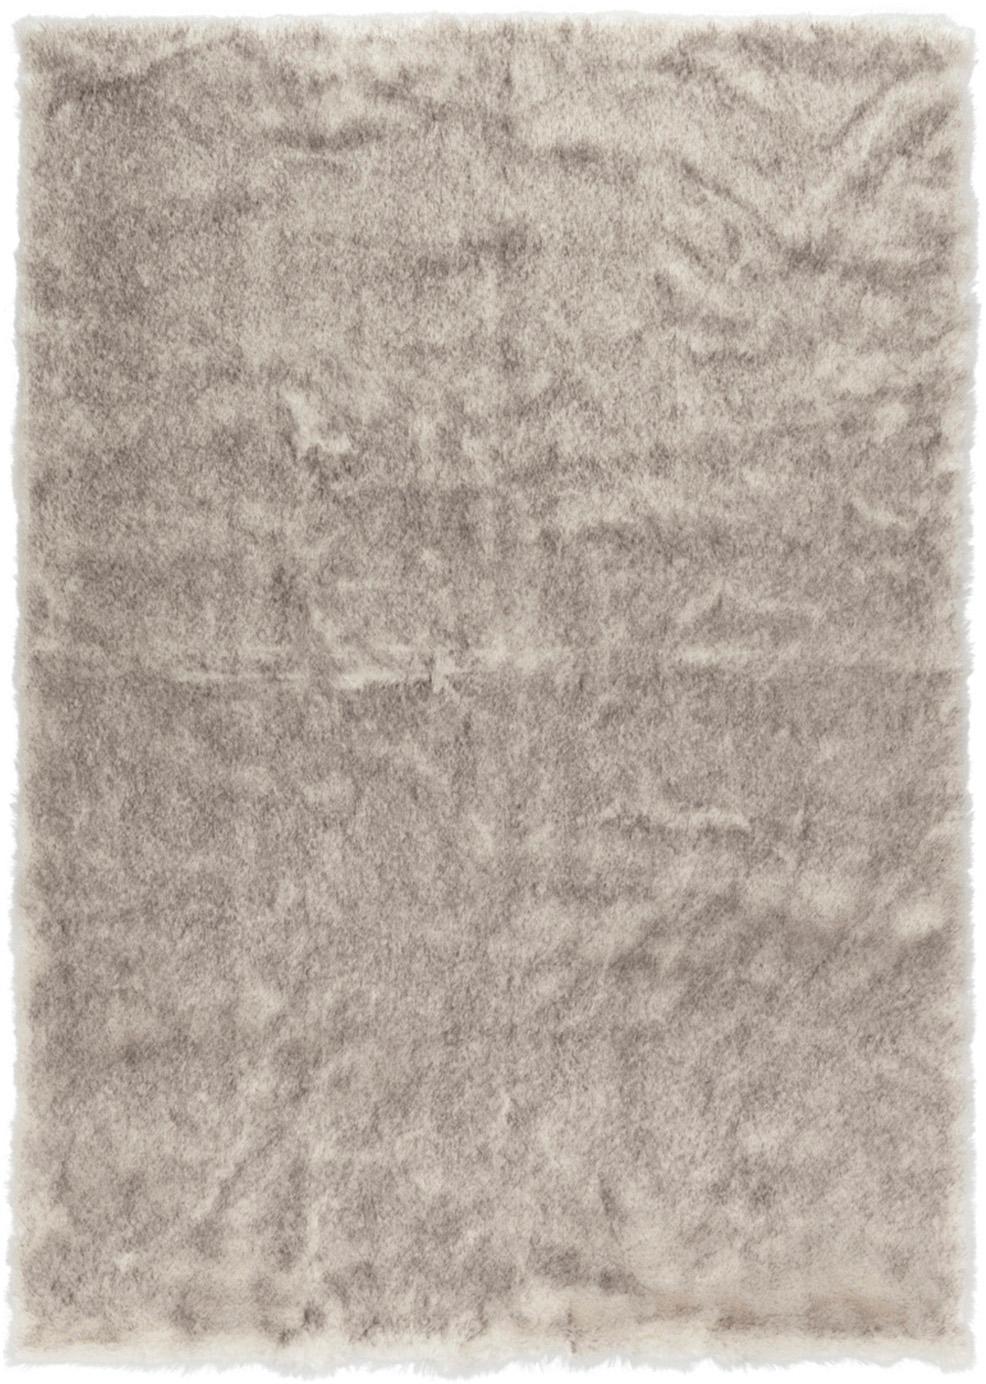 Alfombra de piel sintética Superior, Parte superior: 95% acrílico, 5% poliéste, Reverso: cuero sintético, Crema, beige, blanco, An 160 x L 230 cm (Tamaño M)